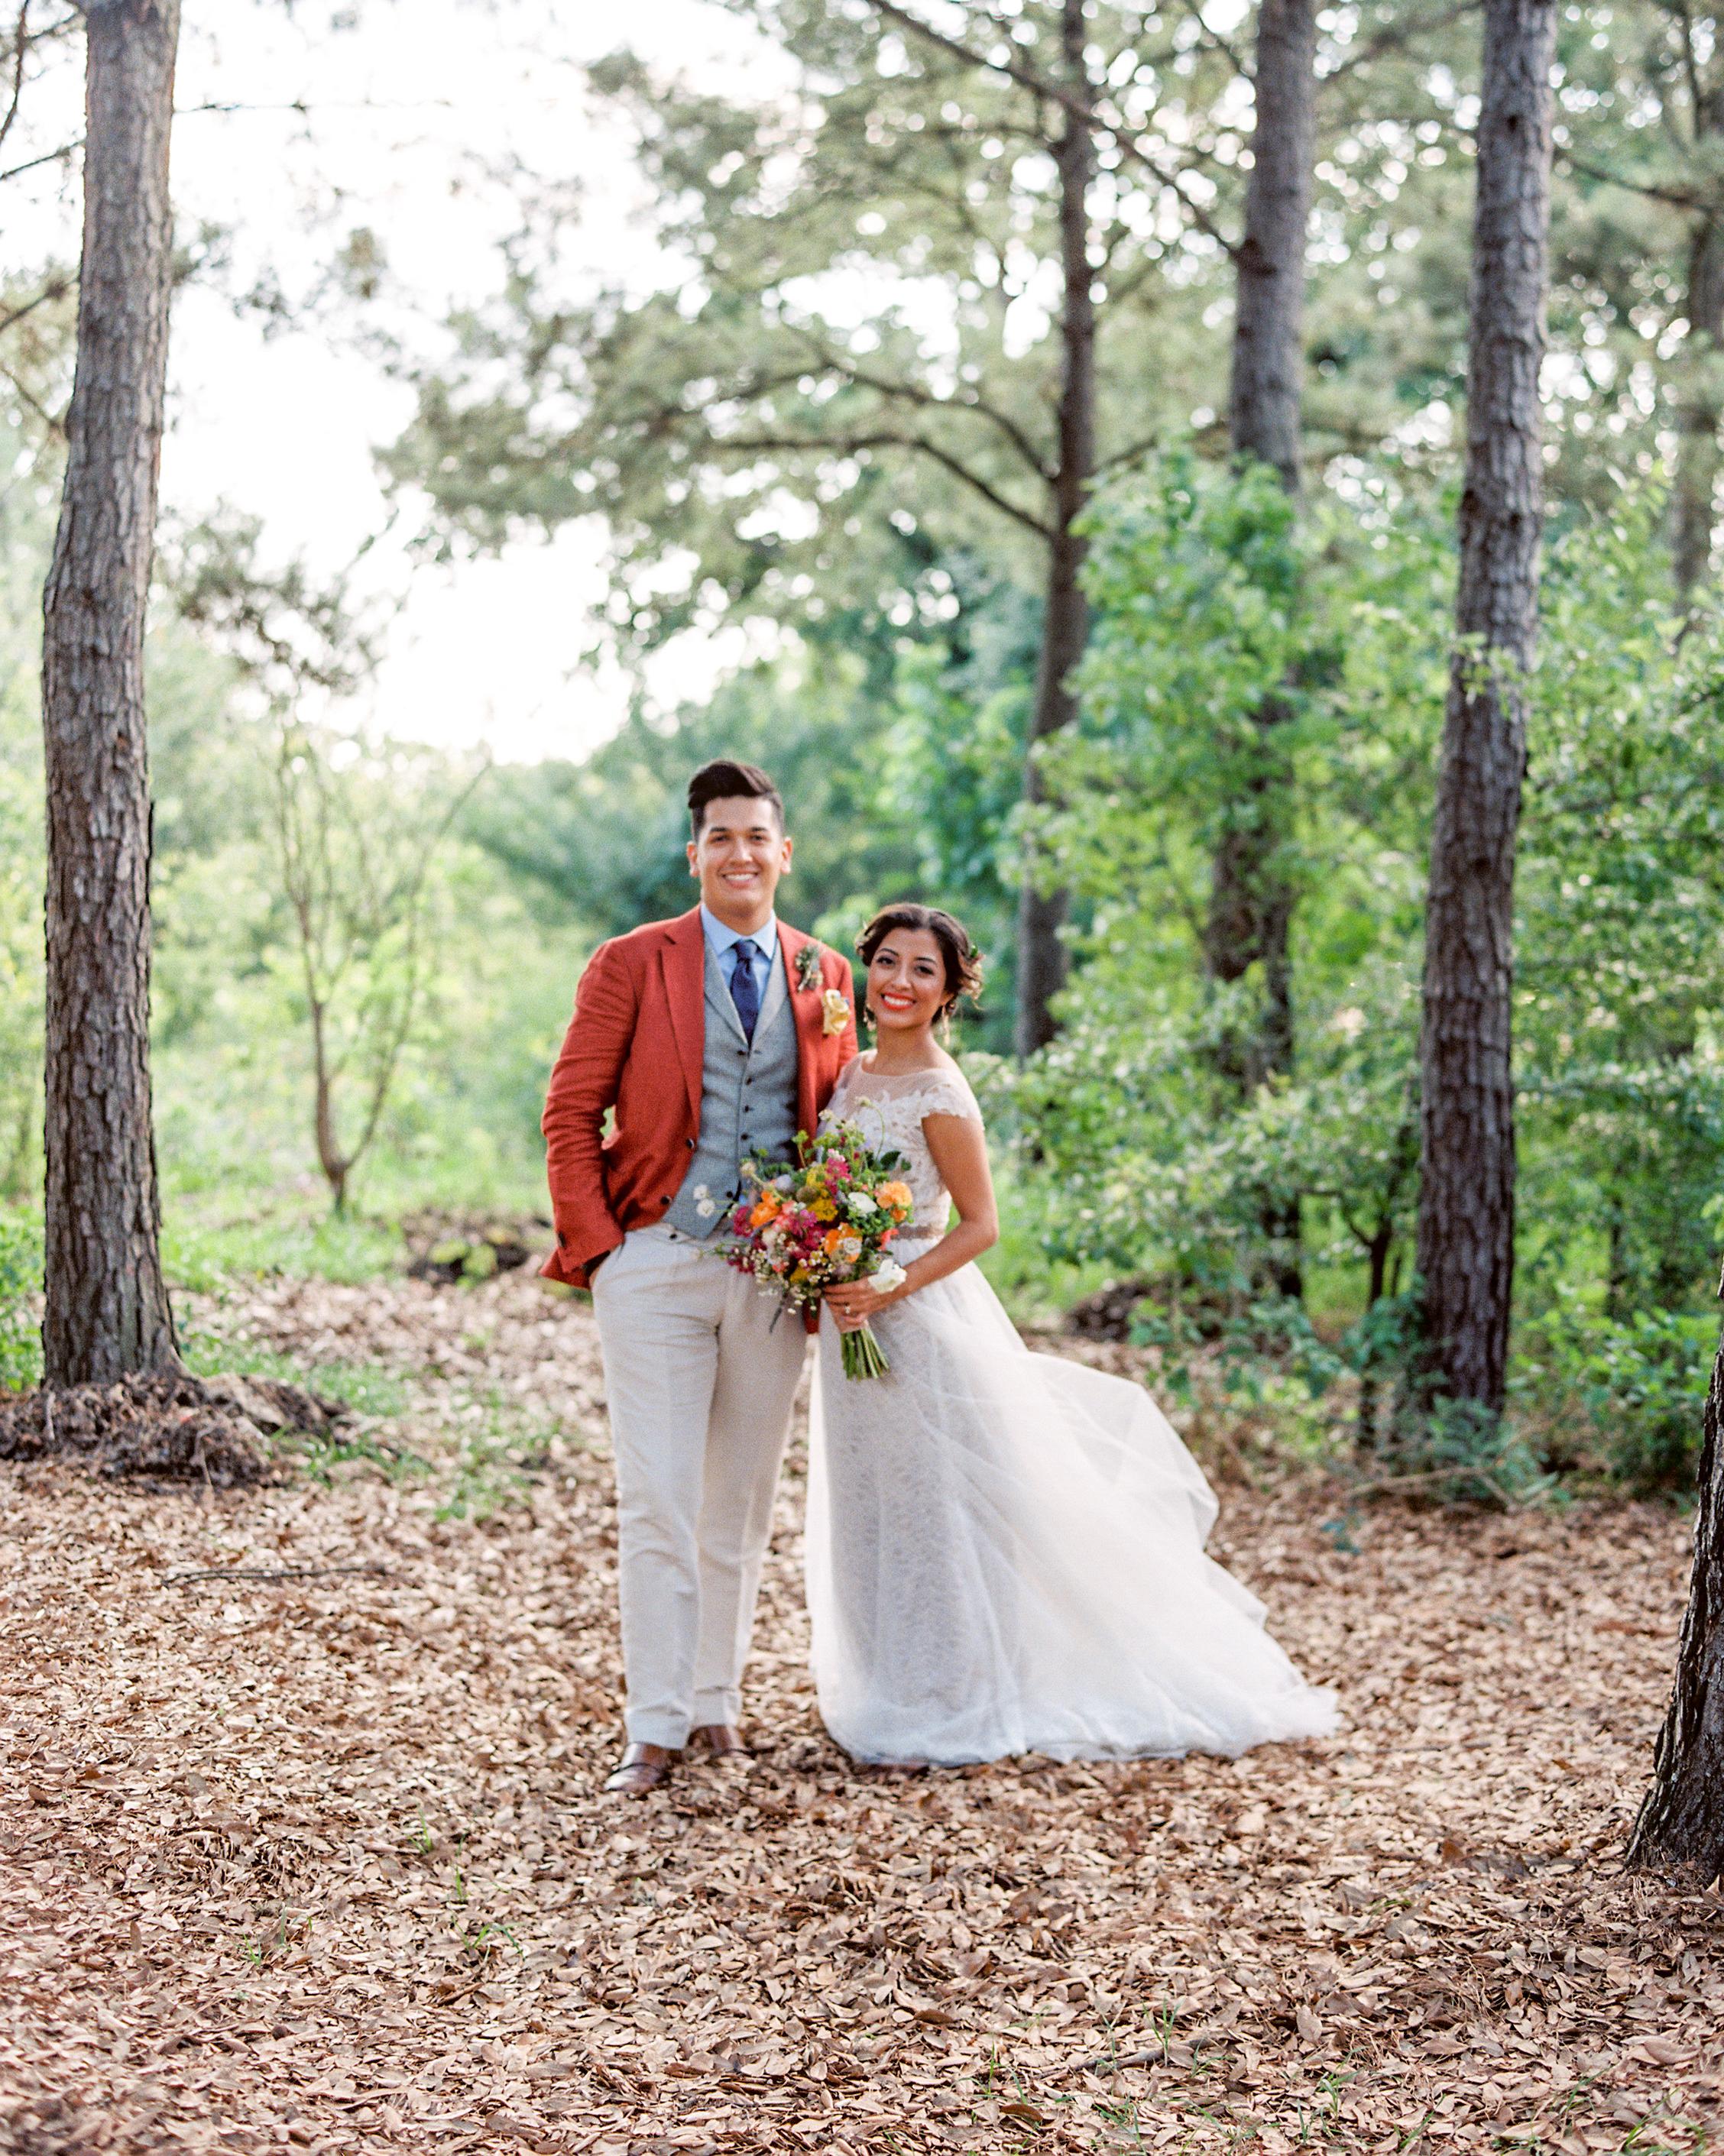 atalia-raul-wedding-couple-21-s112395-1215.jpg